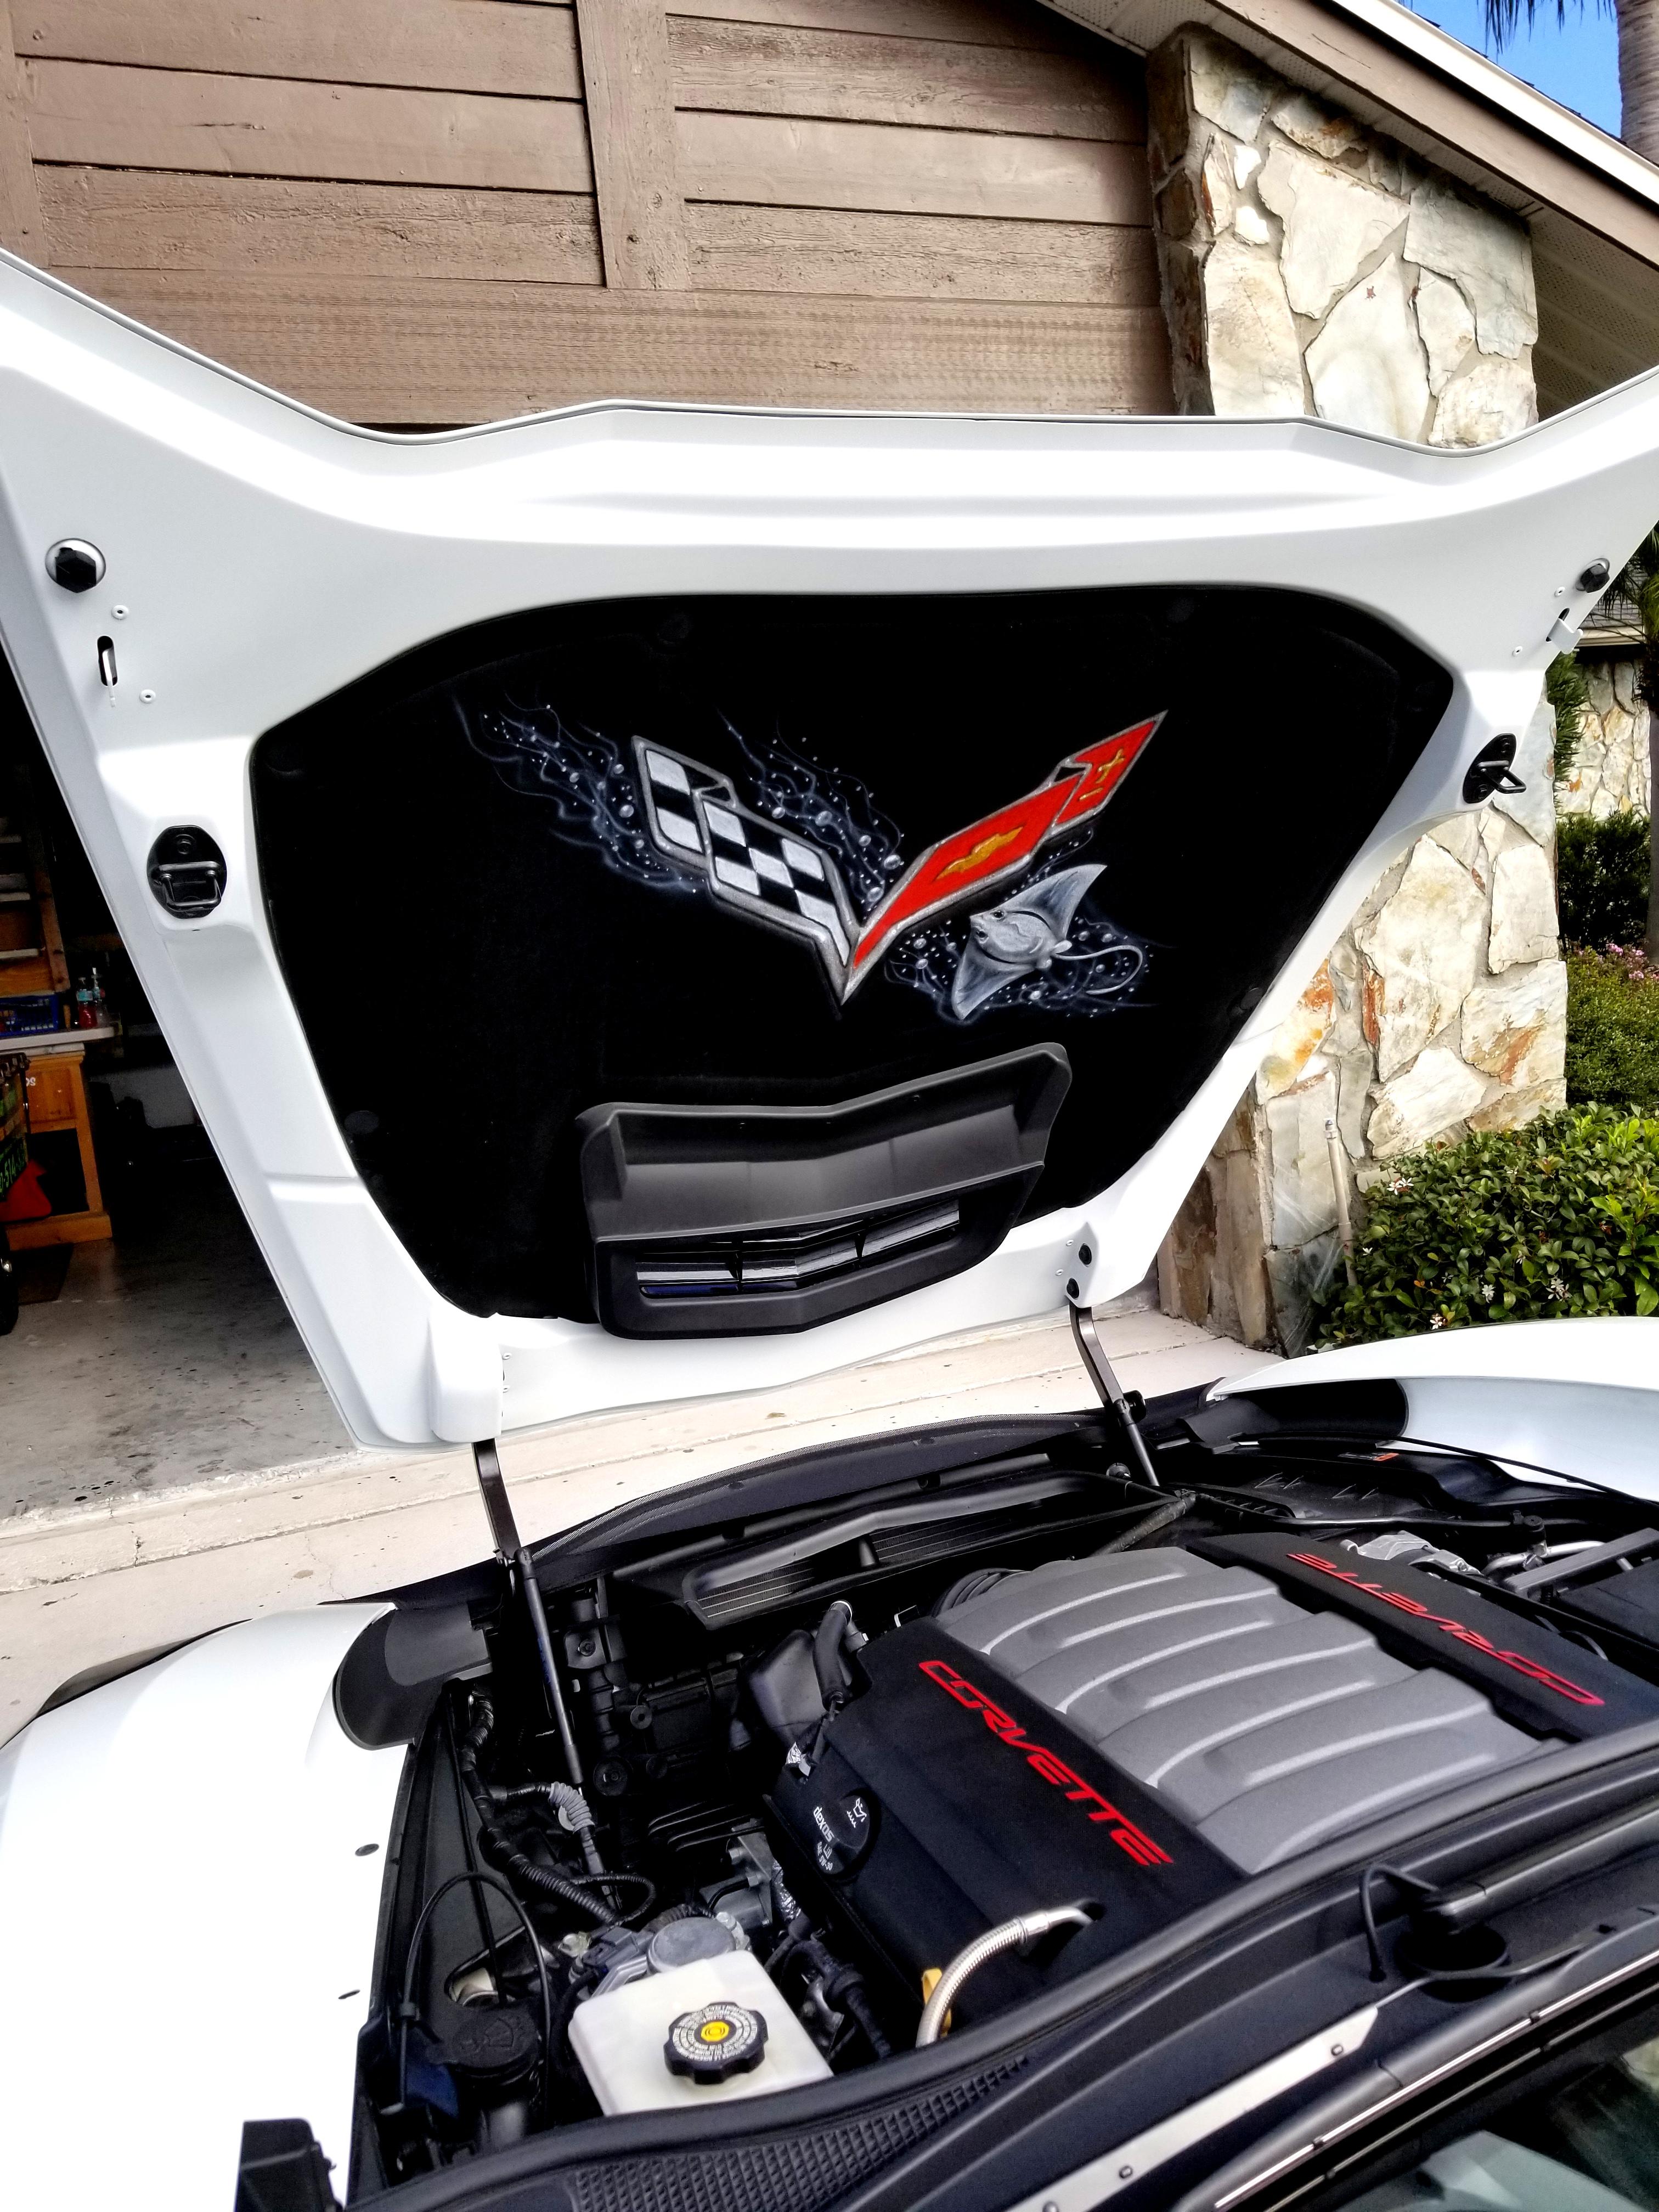 Corvette Hood Liners Amp Others Big Boy Airbrush Co